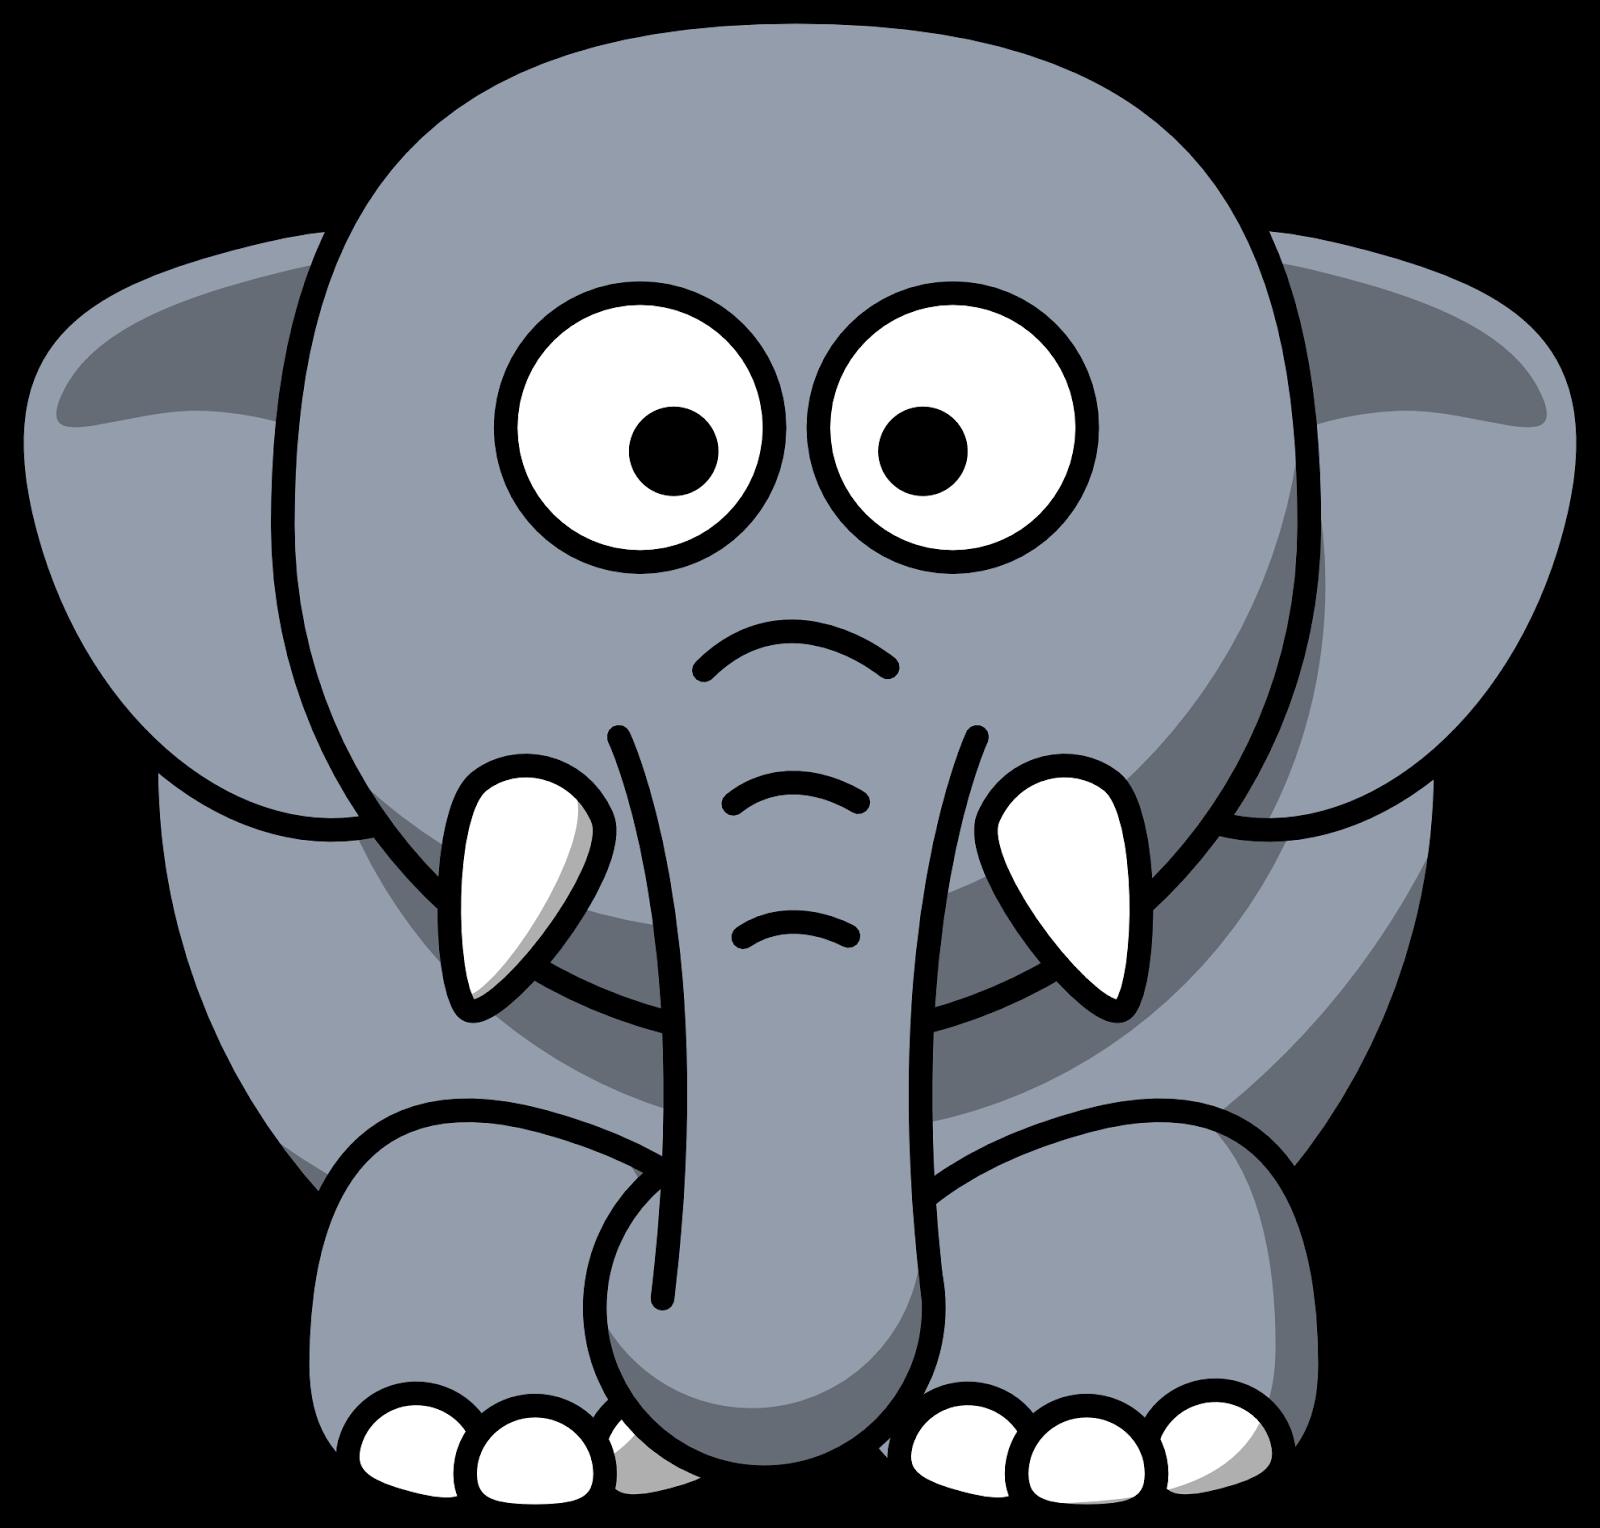 10 Mewarnai Gambar Gajah (With Images) Elephant Clip Art